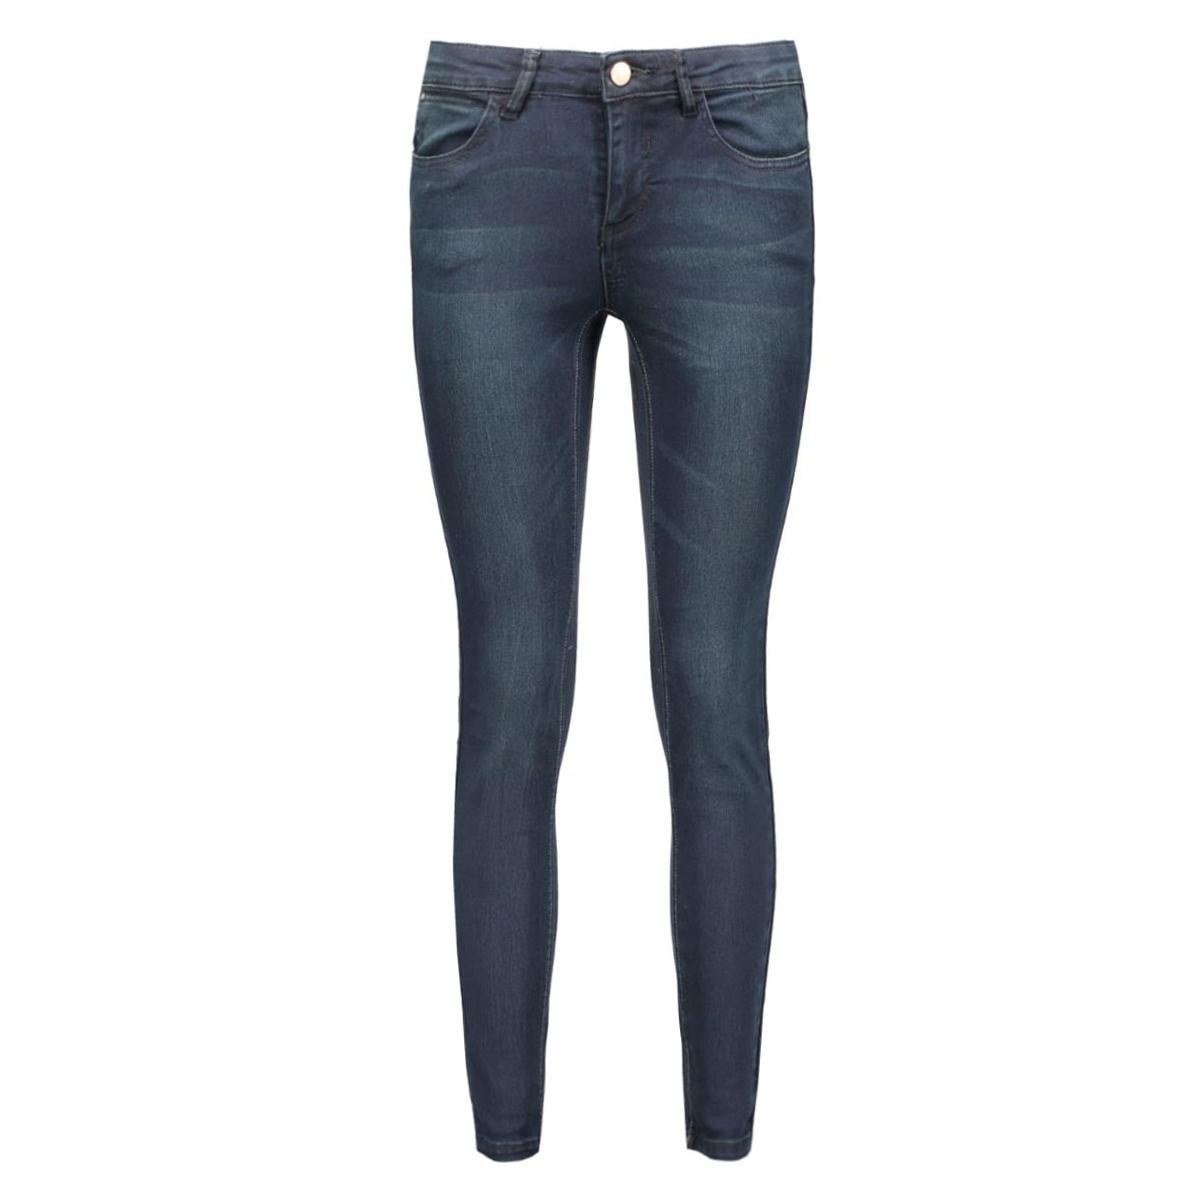 vicommit rw 5p 7/8 hk0148 14037129 vila jeans dark blue denim